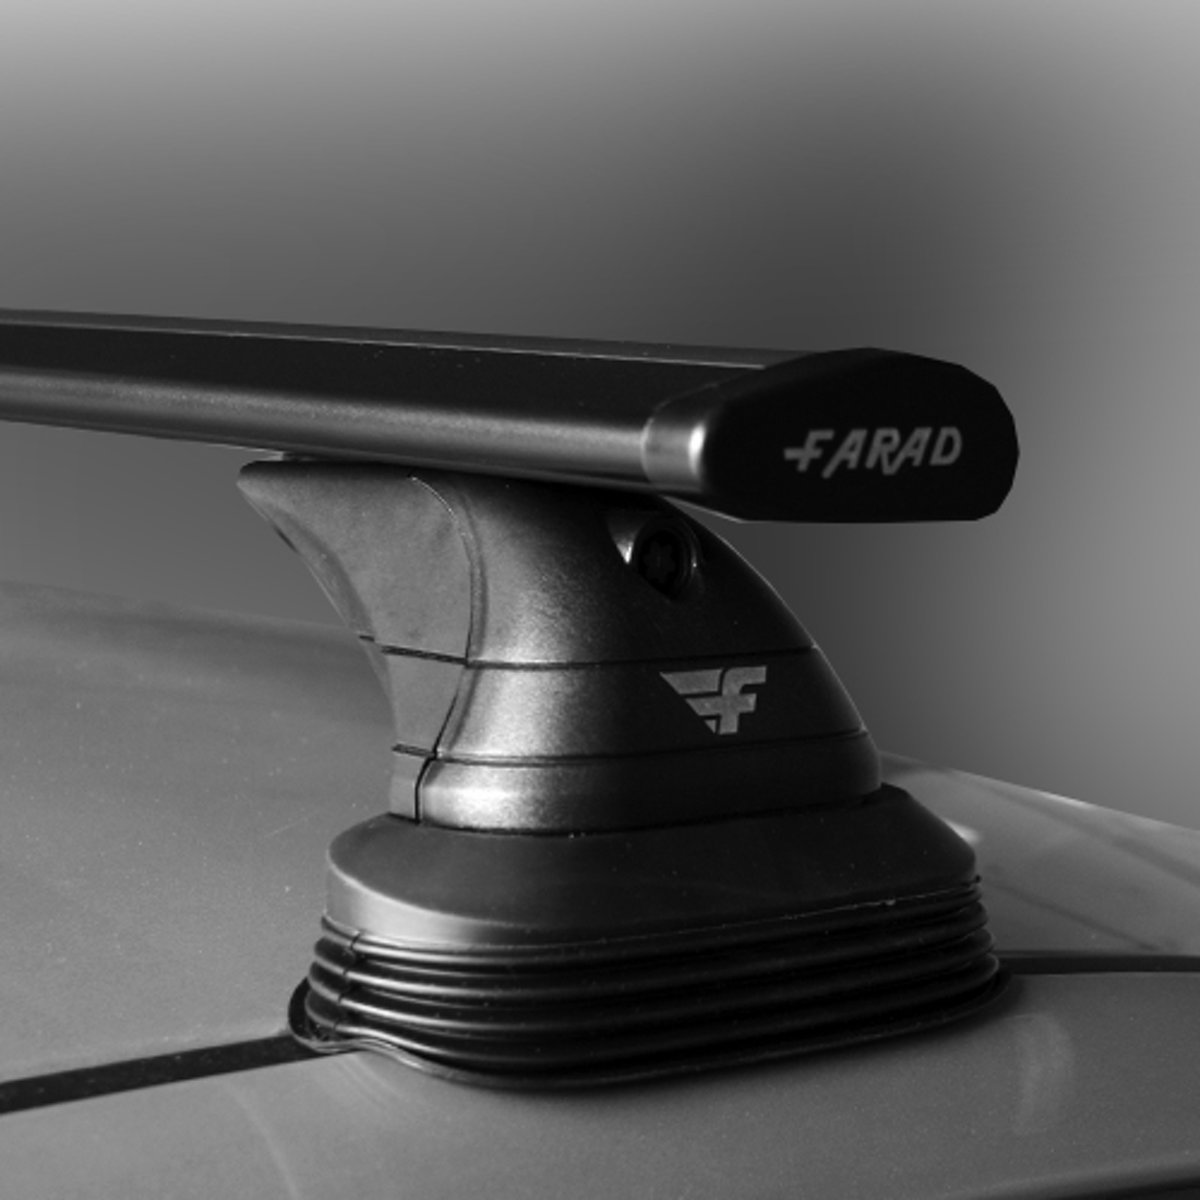 Dakdragers Mercedes GLE Coupe vanaf 2015 - Farad wingbar zwart kopen